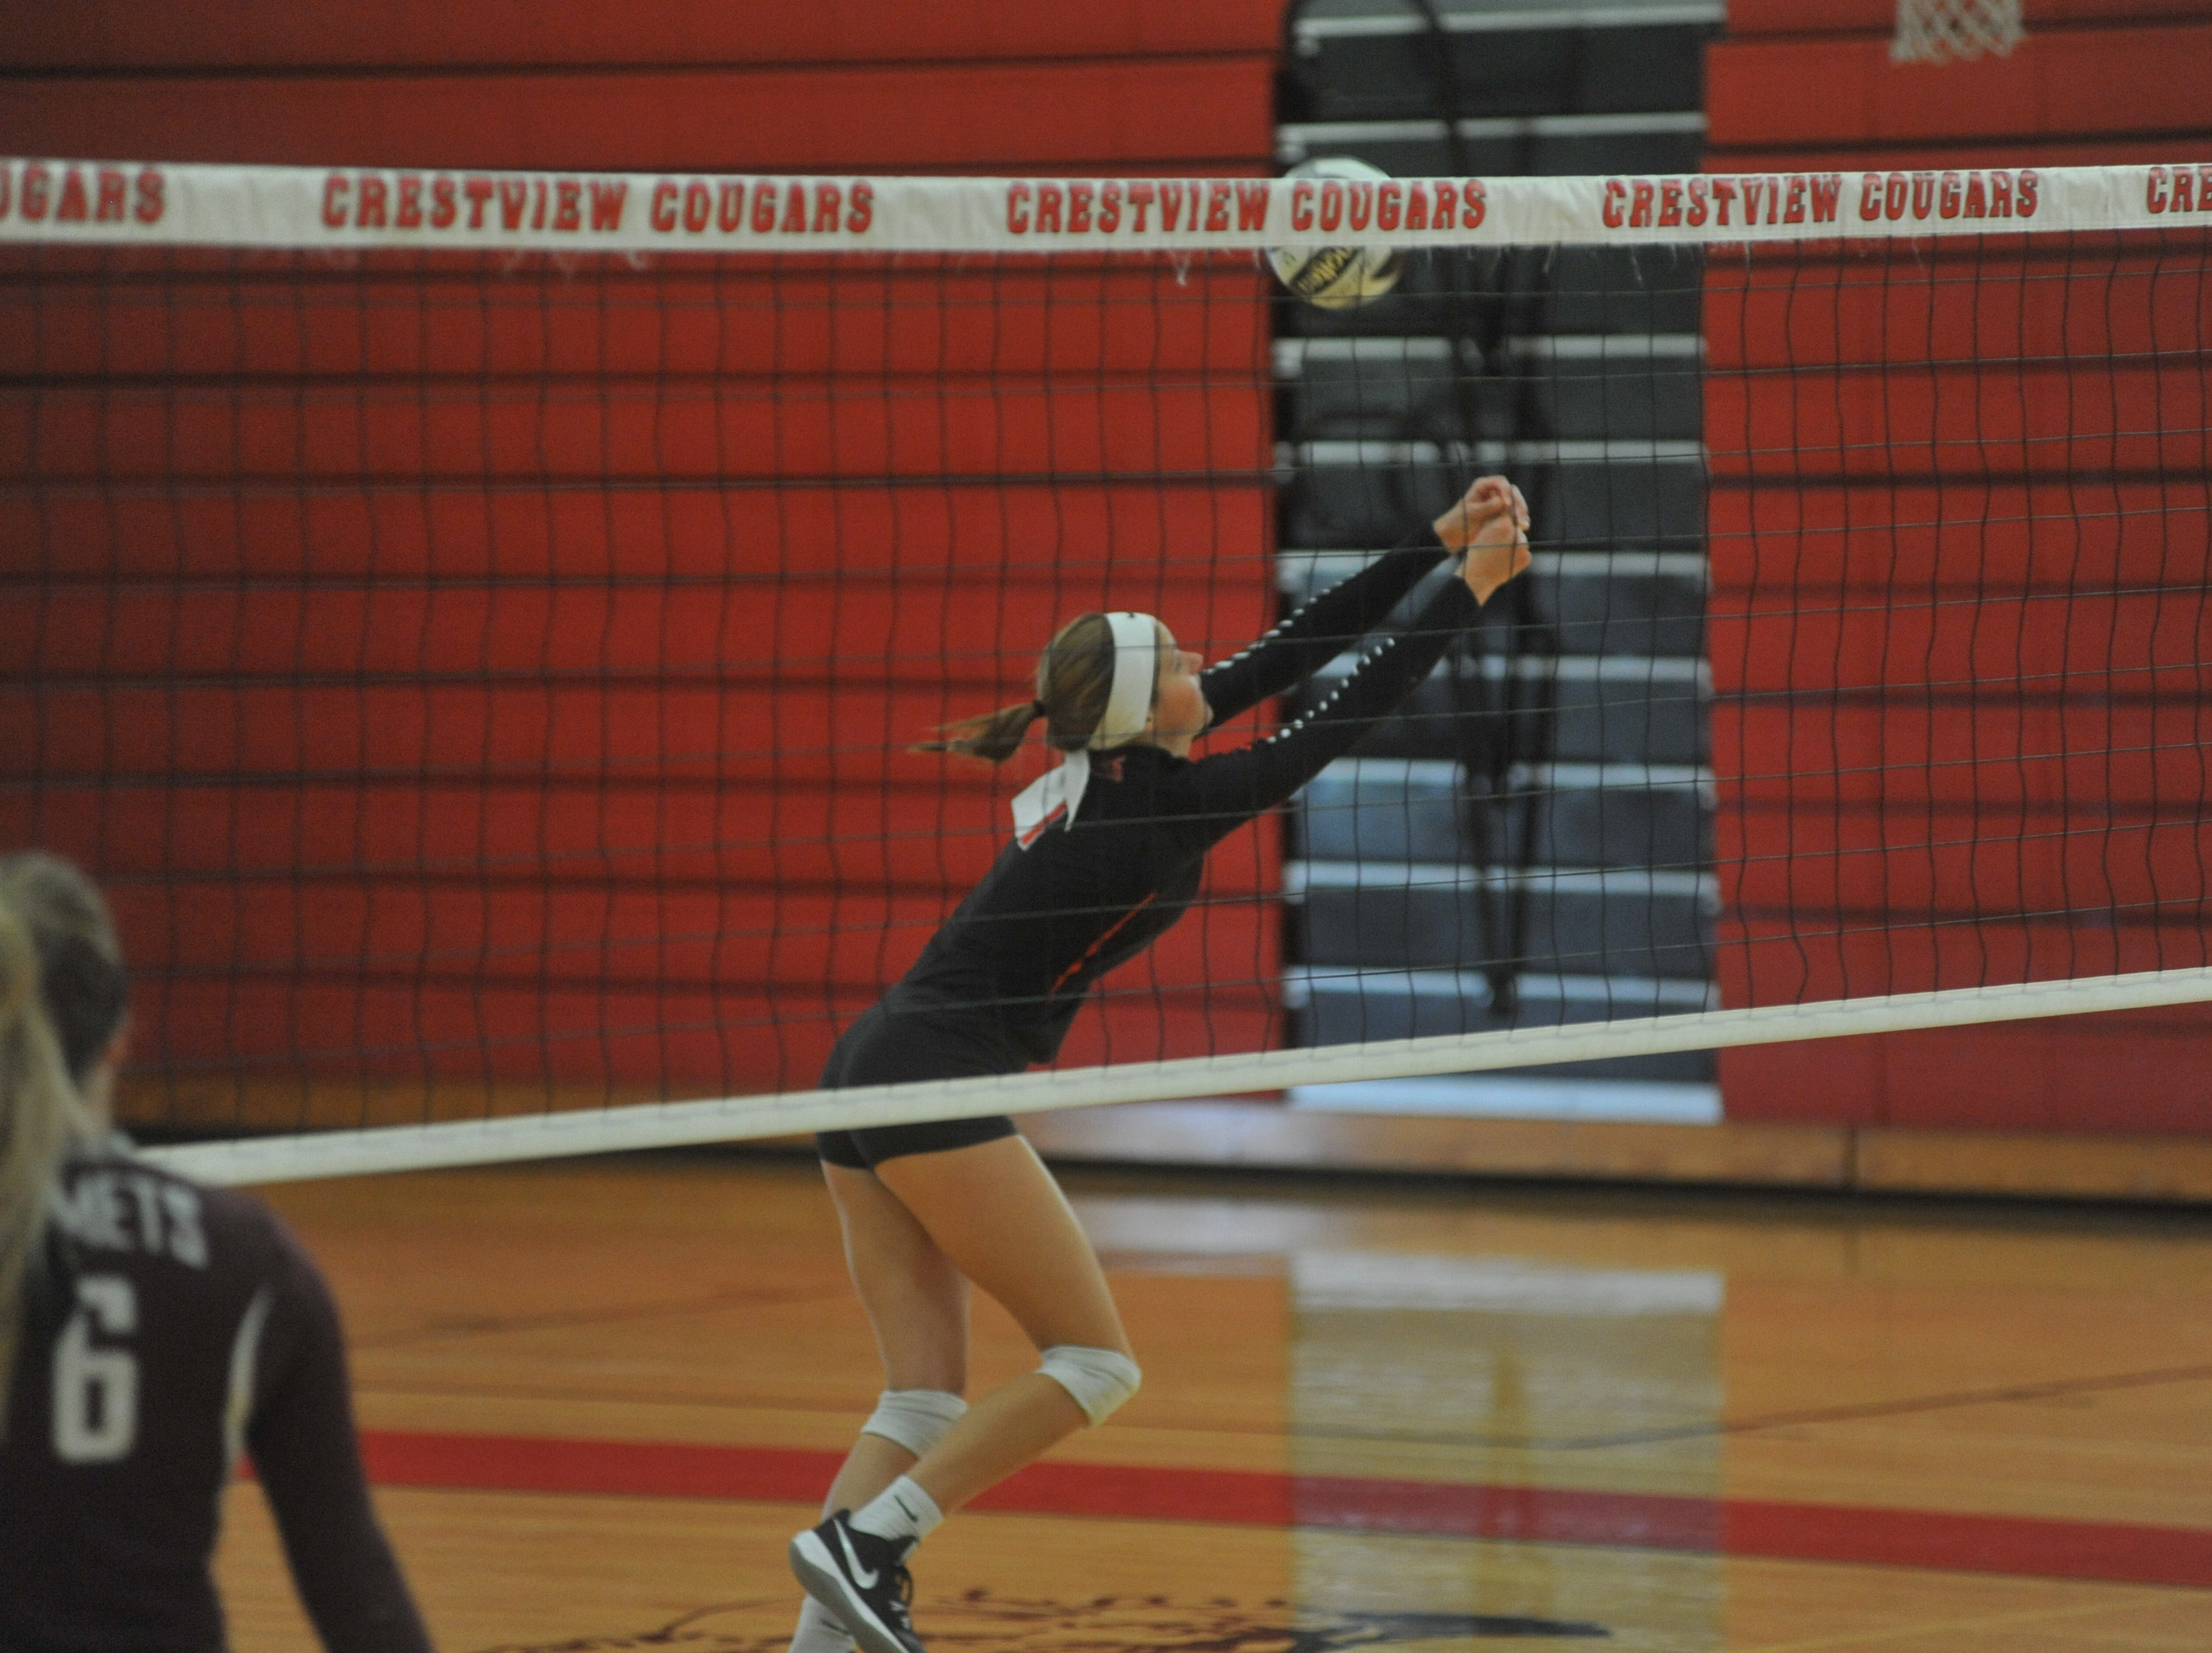 Crestview's Natalie Restille reaches for a ball.